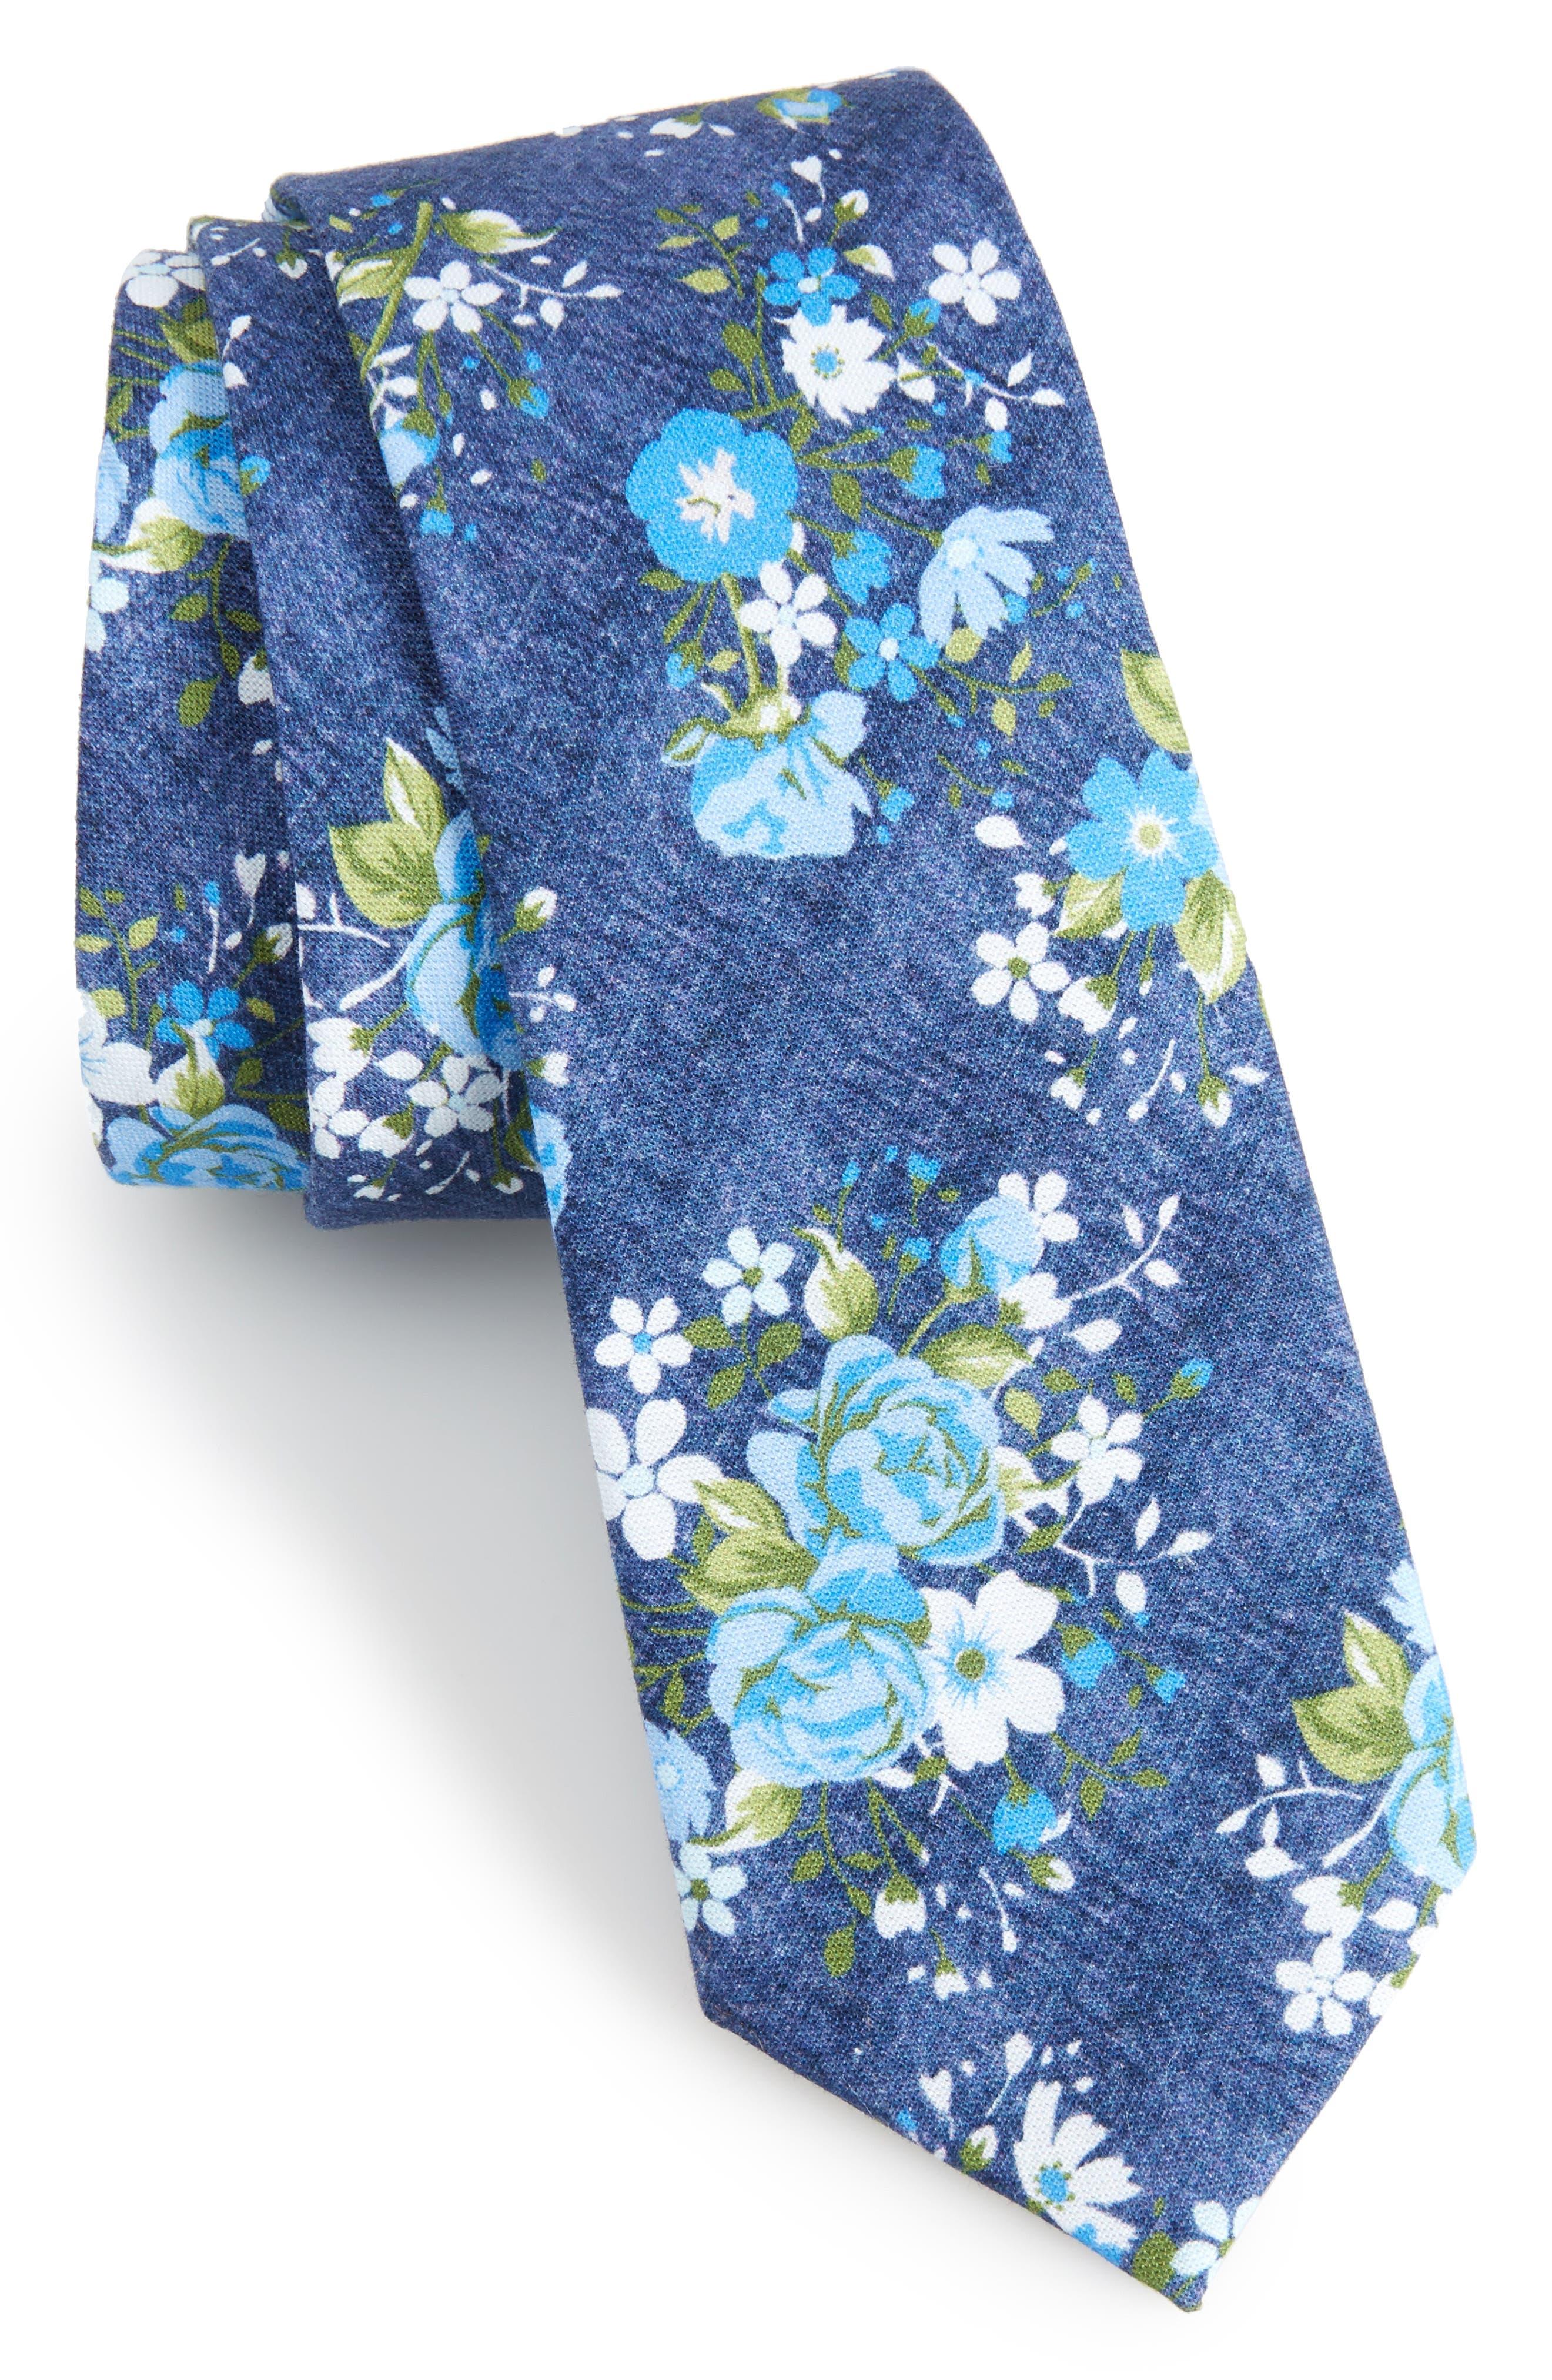 Alternate Image 1 Selected - Nordstrom Men's Shop Morgan Floral Cotton Skinny Tie